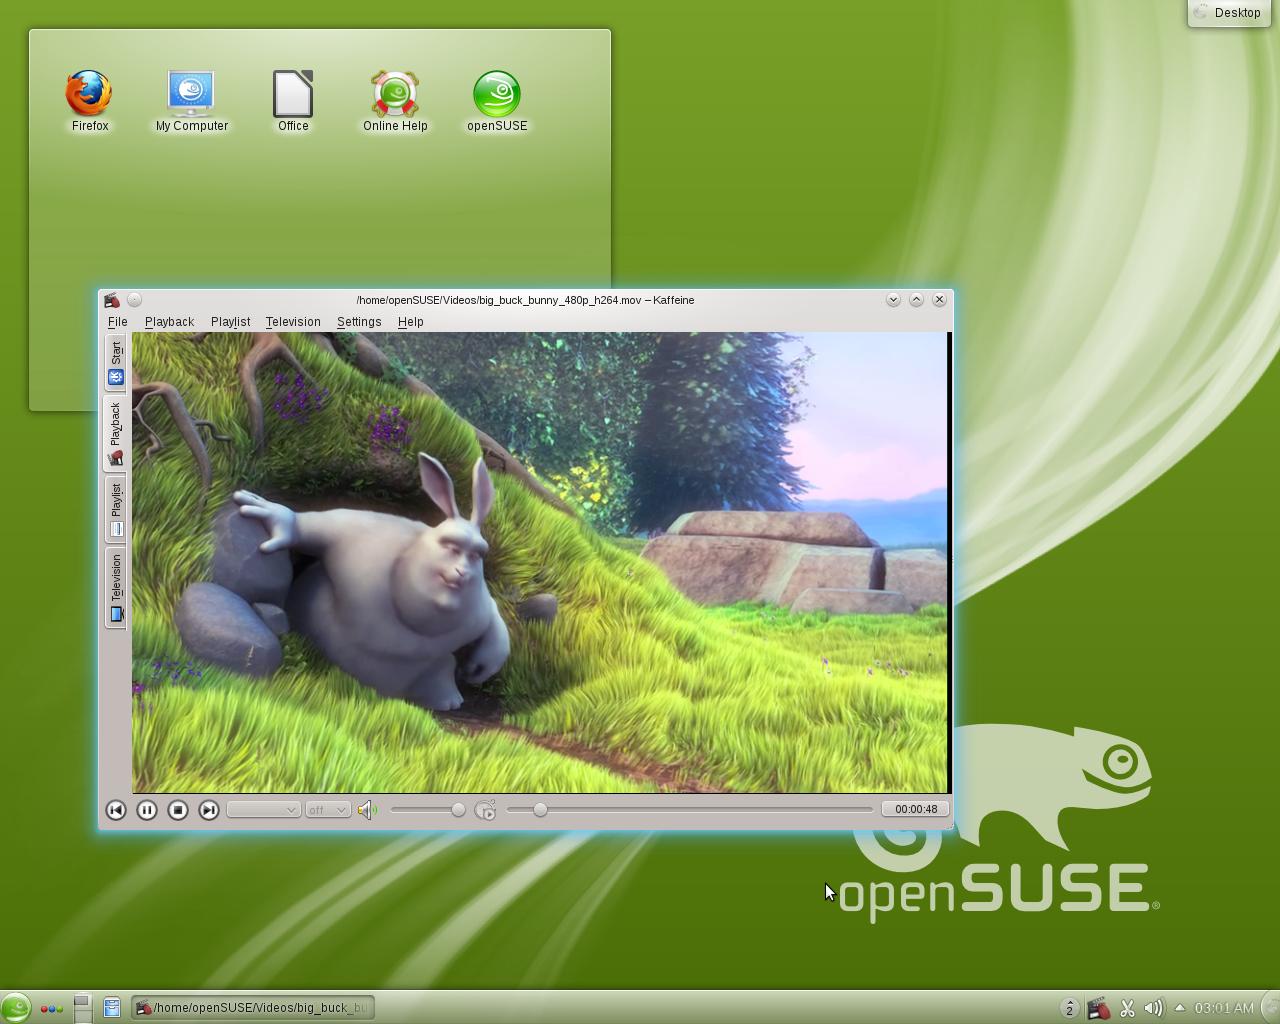 openSUSE 12.1 KDE Desktop